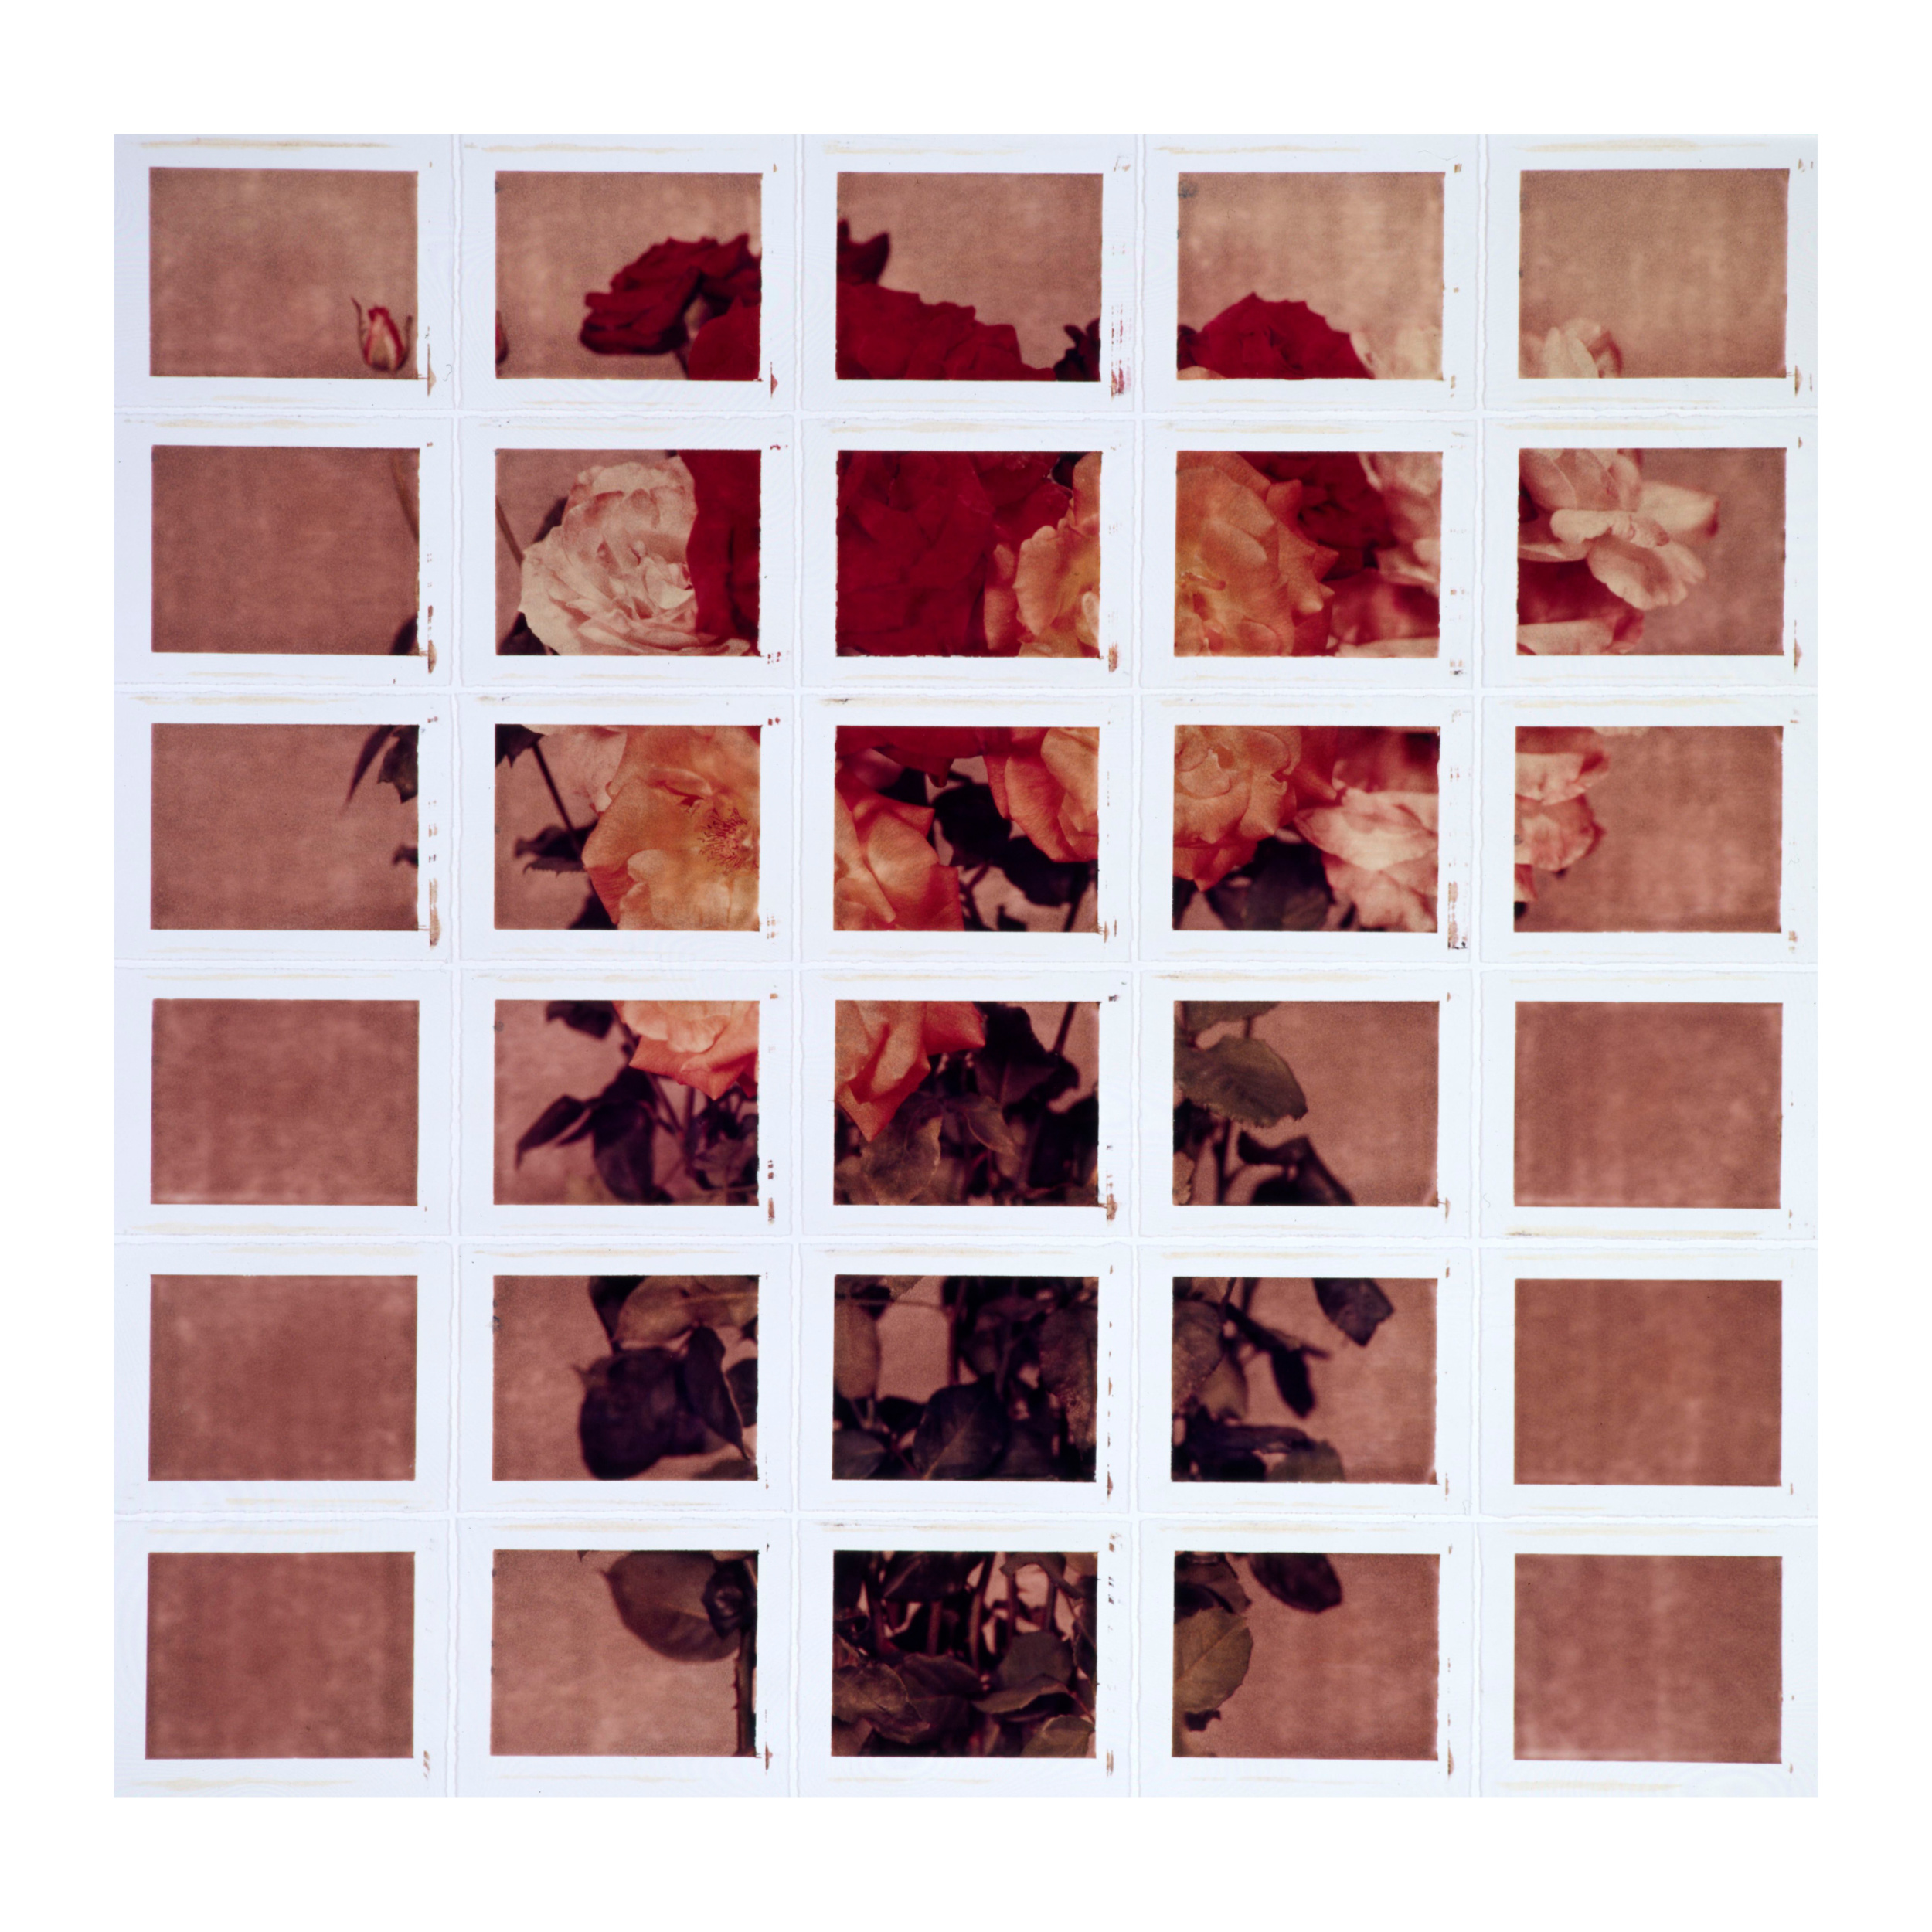 Roses #2, 2001